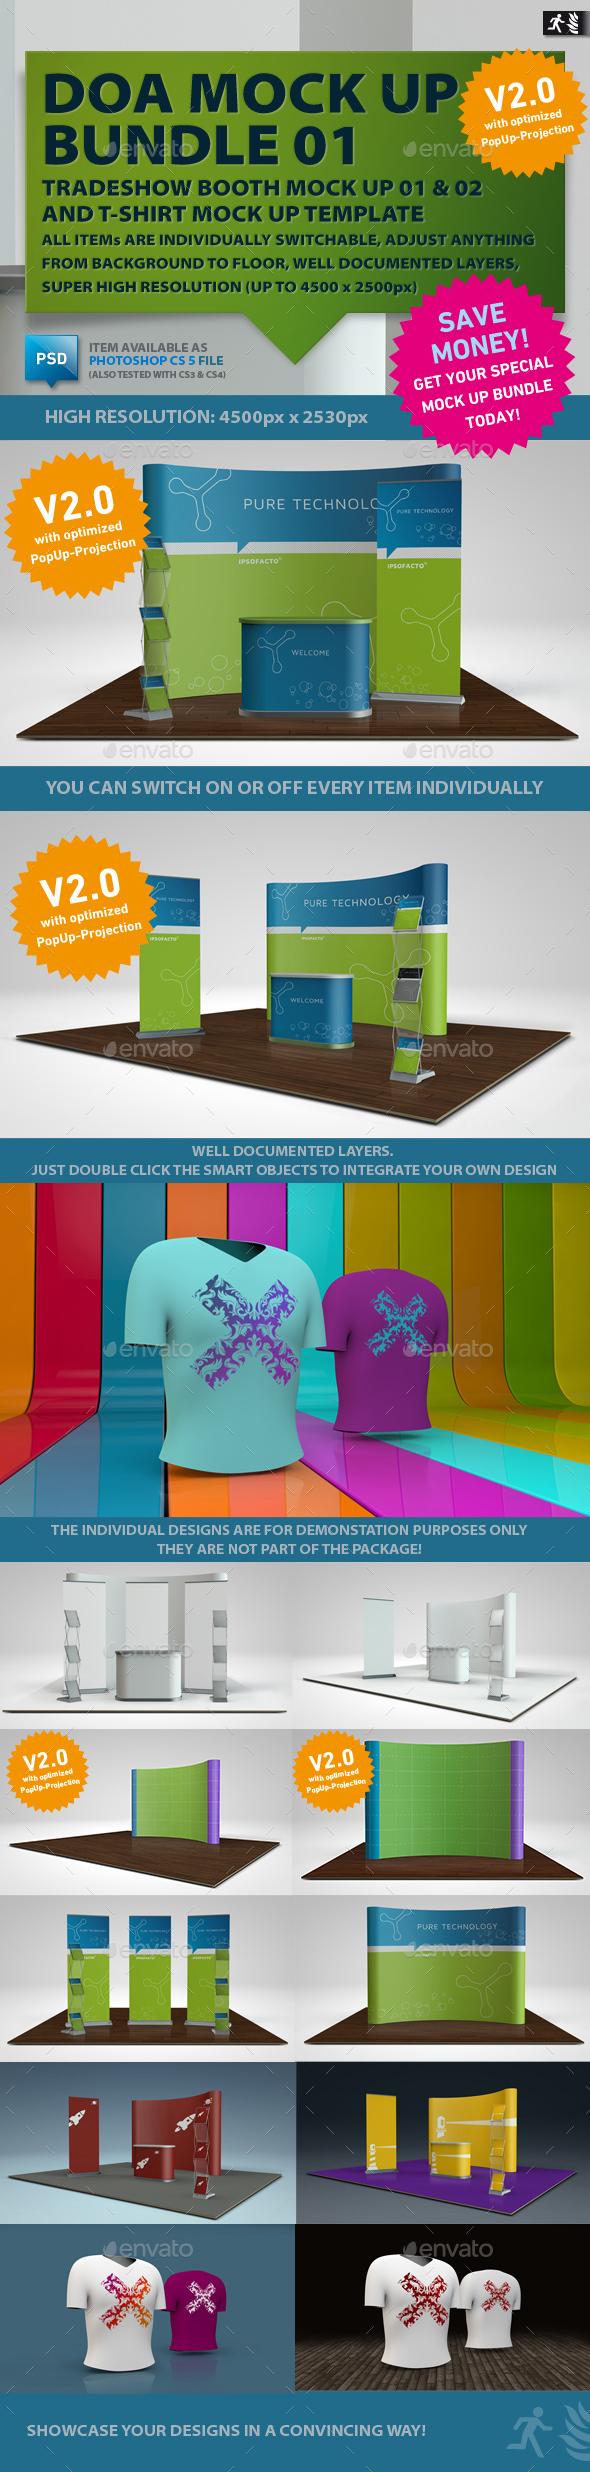 DOA Mock Up Bundle 01 - Miscellaneous Displays